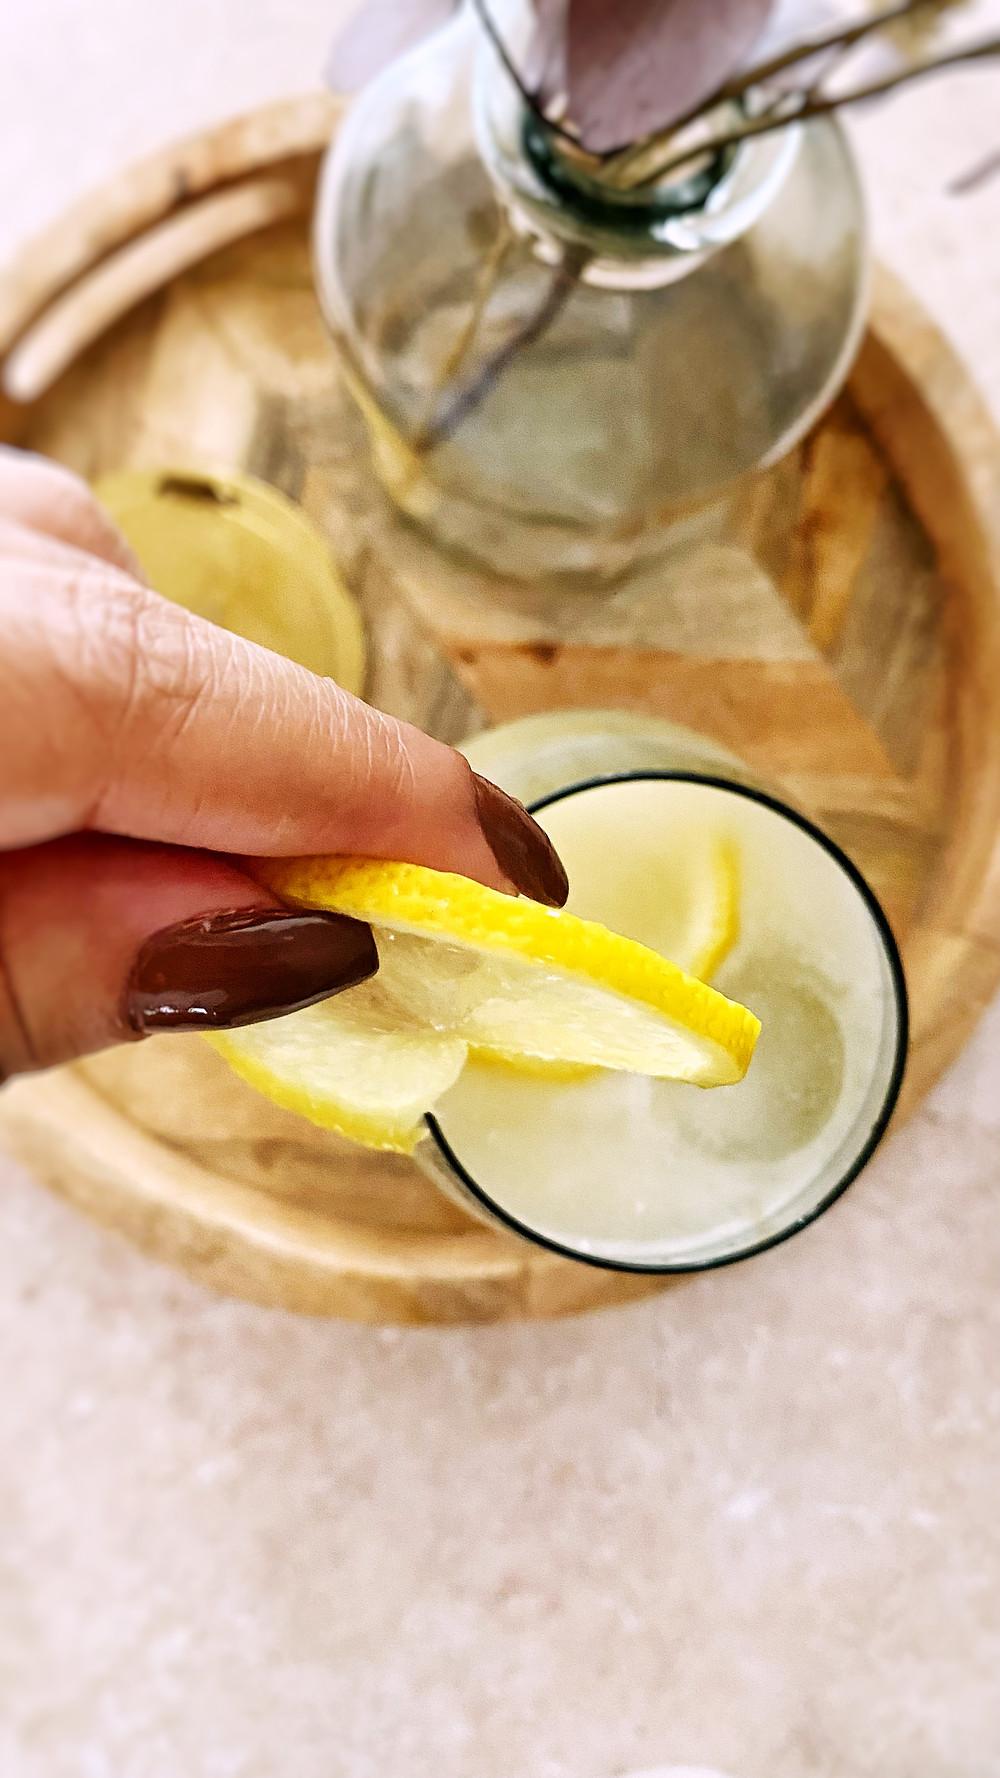 NUTRITIONIST KAY ALI'S VIRGIN PINA COLADA MOSCOW MULE RECIPE